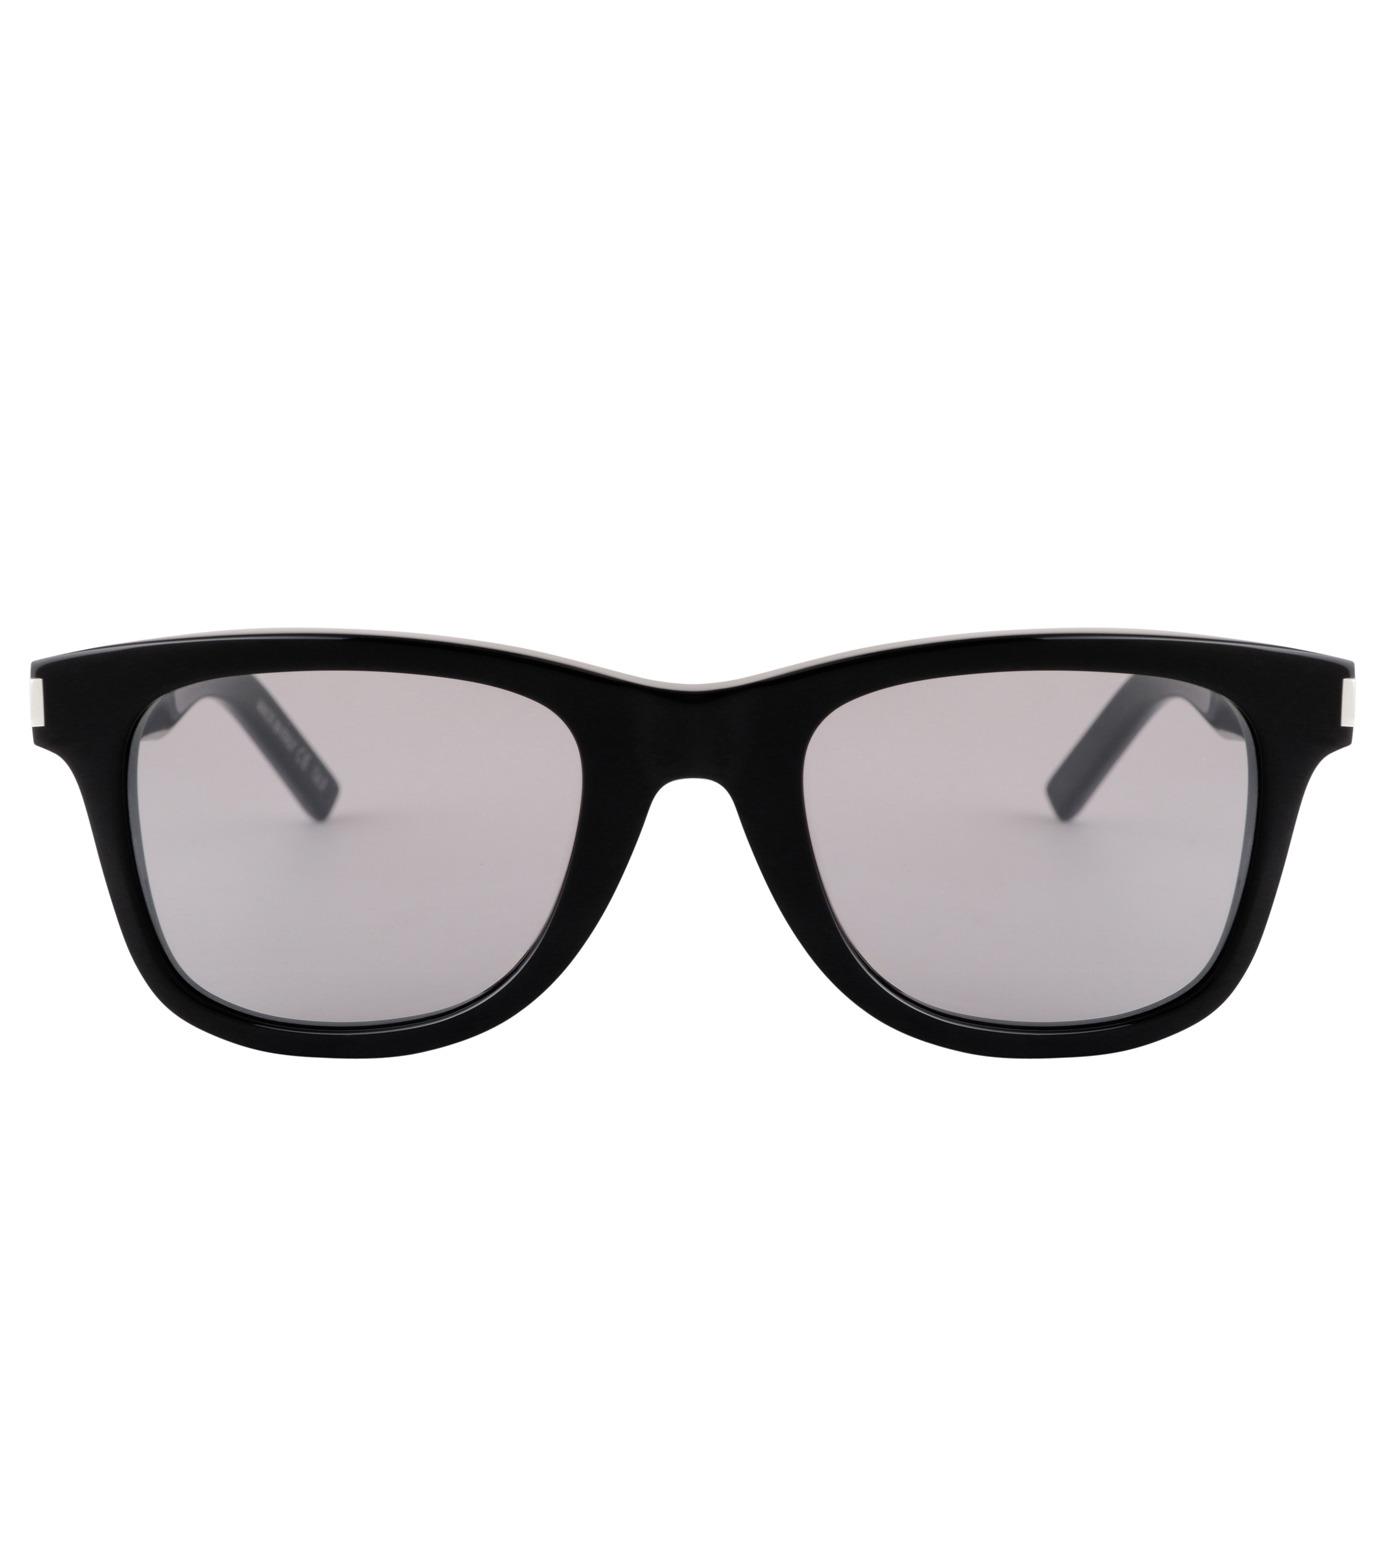 SAINT LAURENT(サンローラン)のSL 51 Square Flame-BLACK(アイウェア/eyewear)-419700-13 拡大詳細画像3